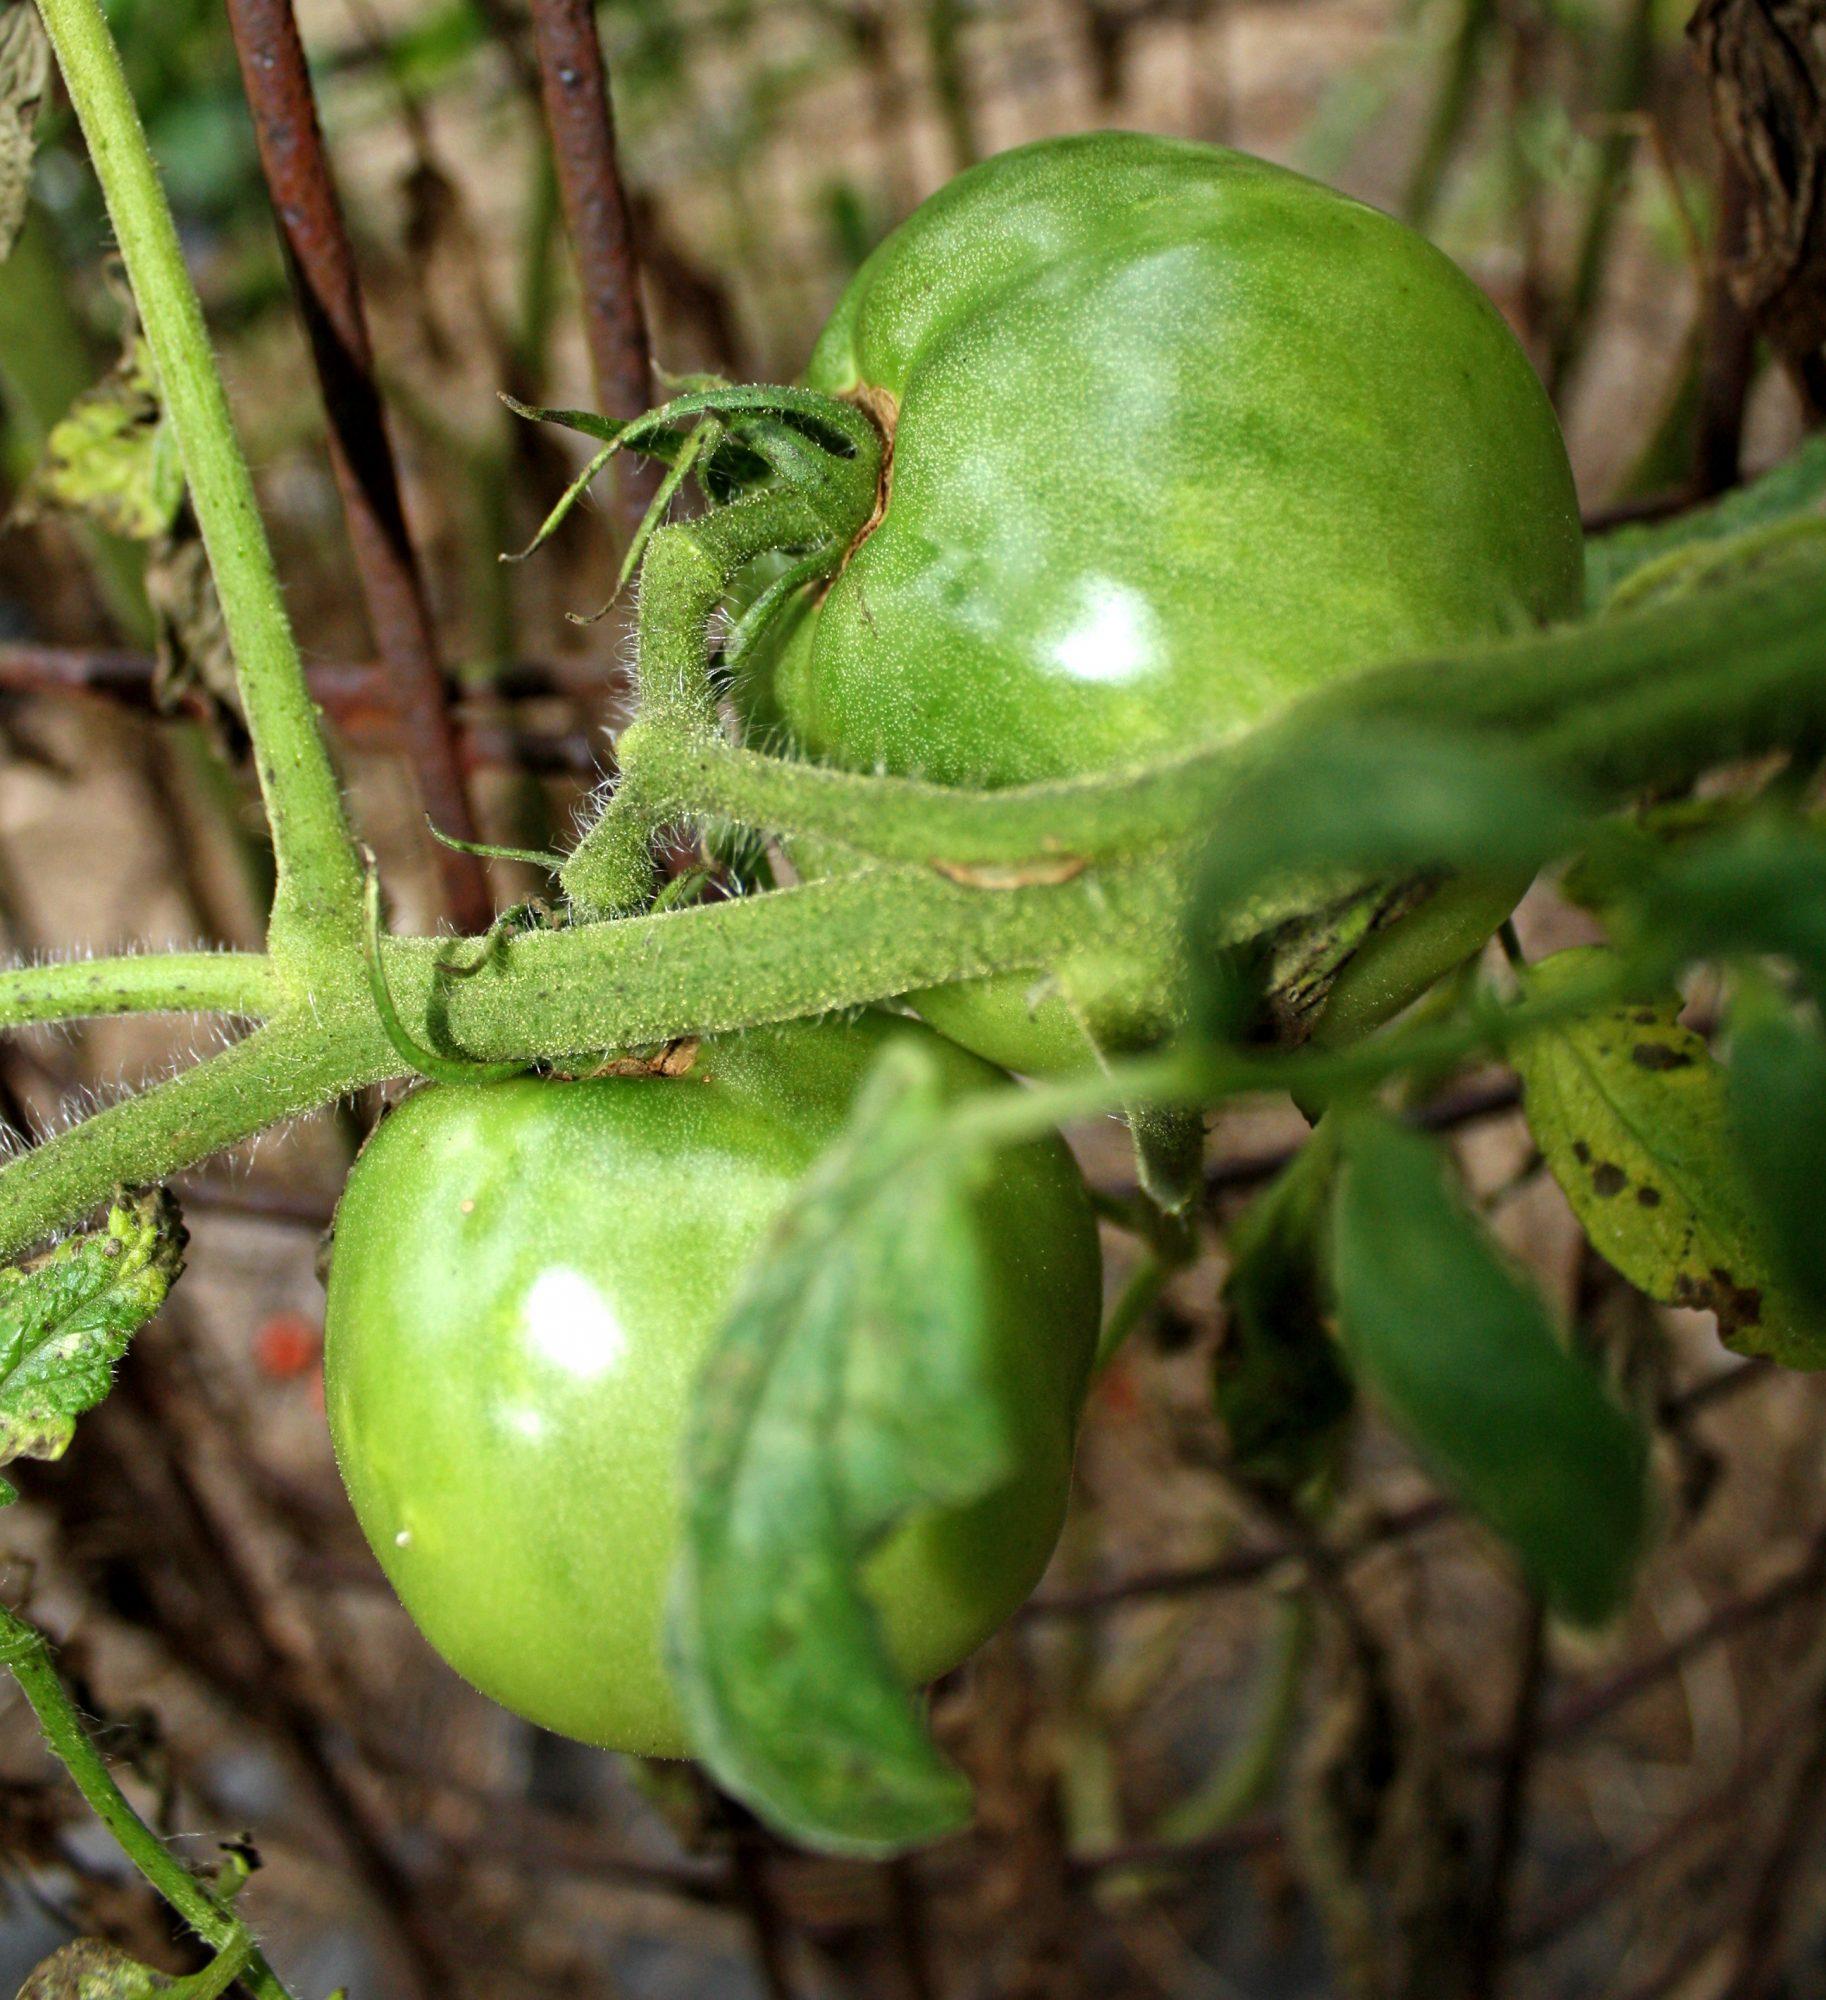 green-tomatoes-on-vine.jpg